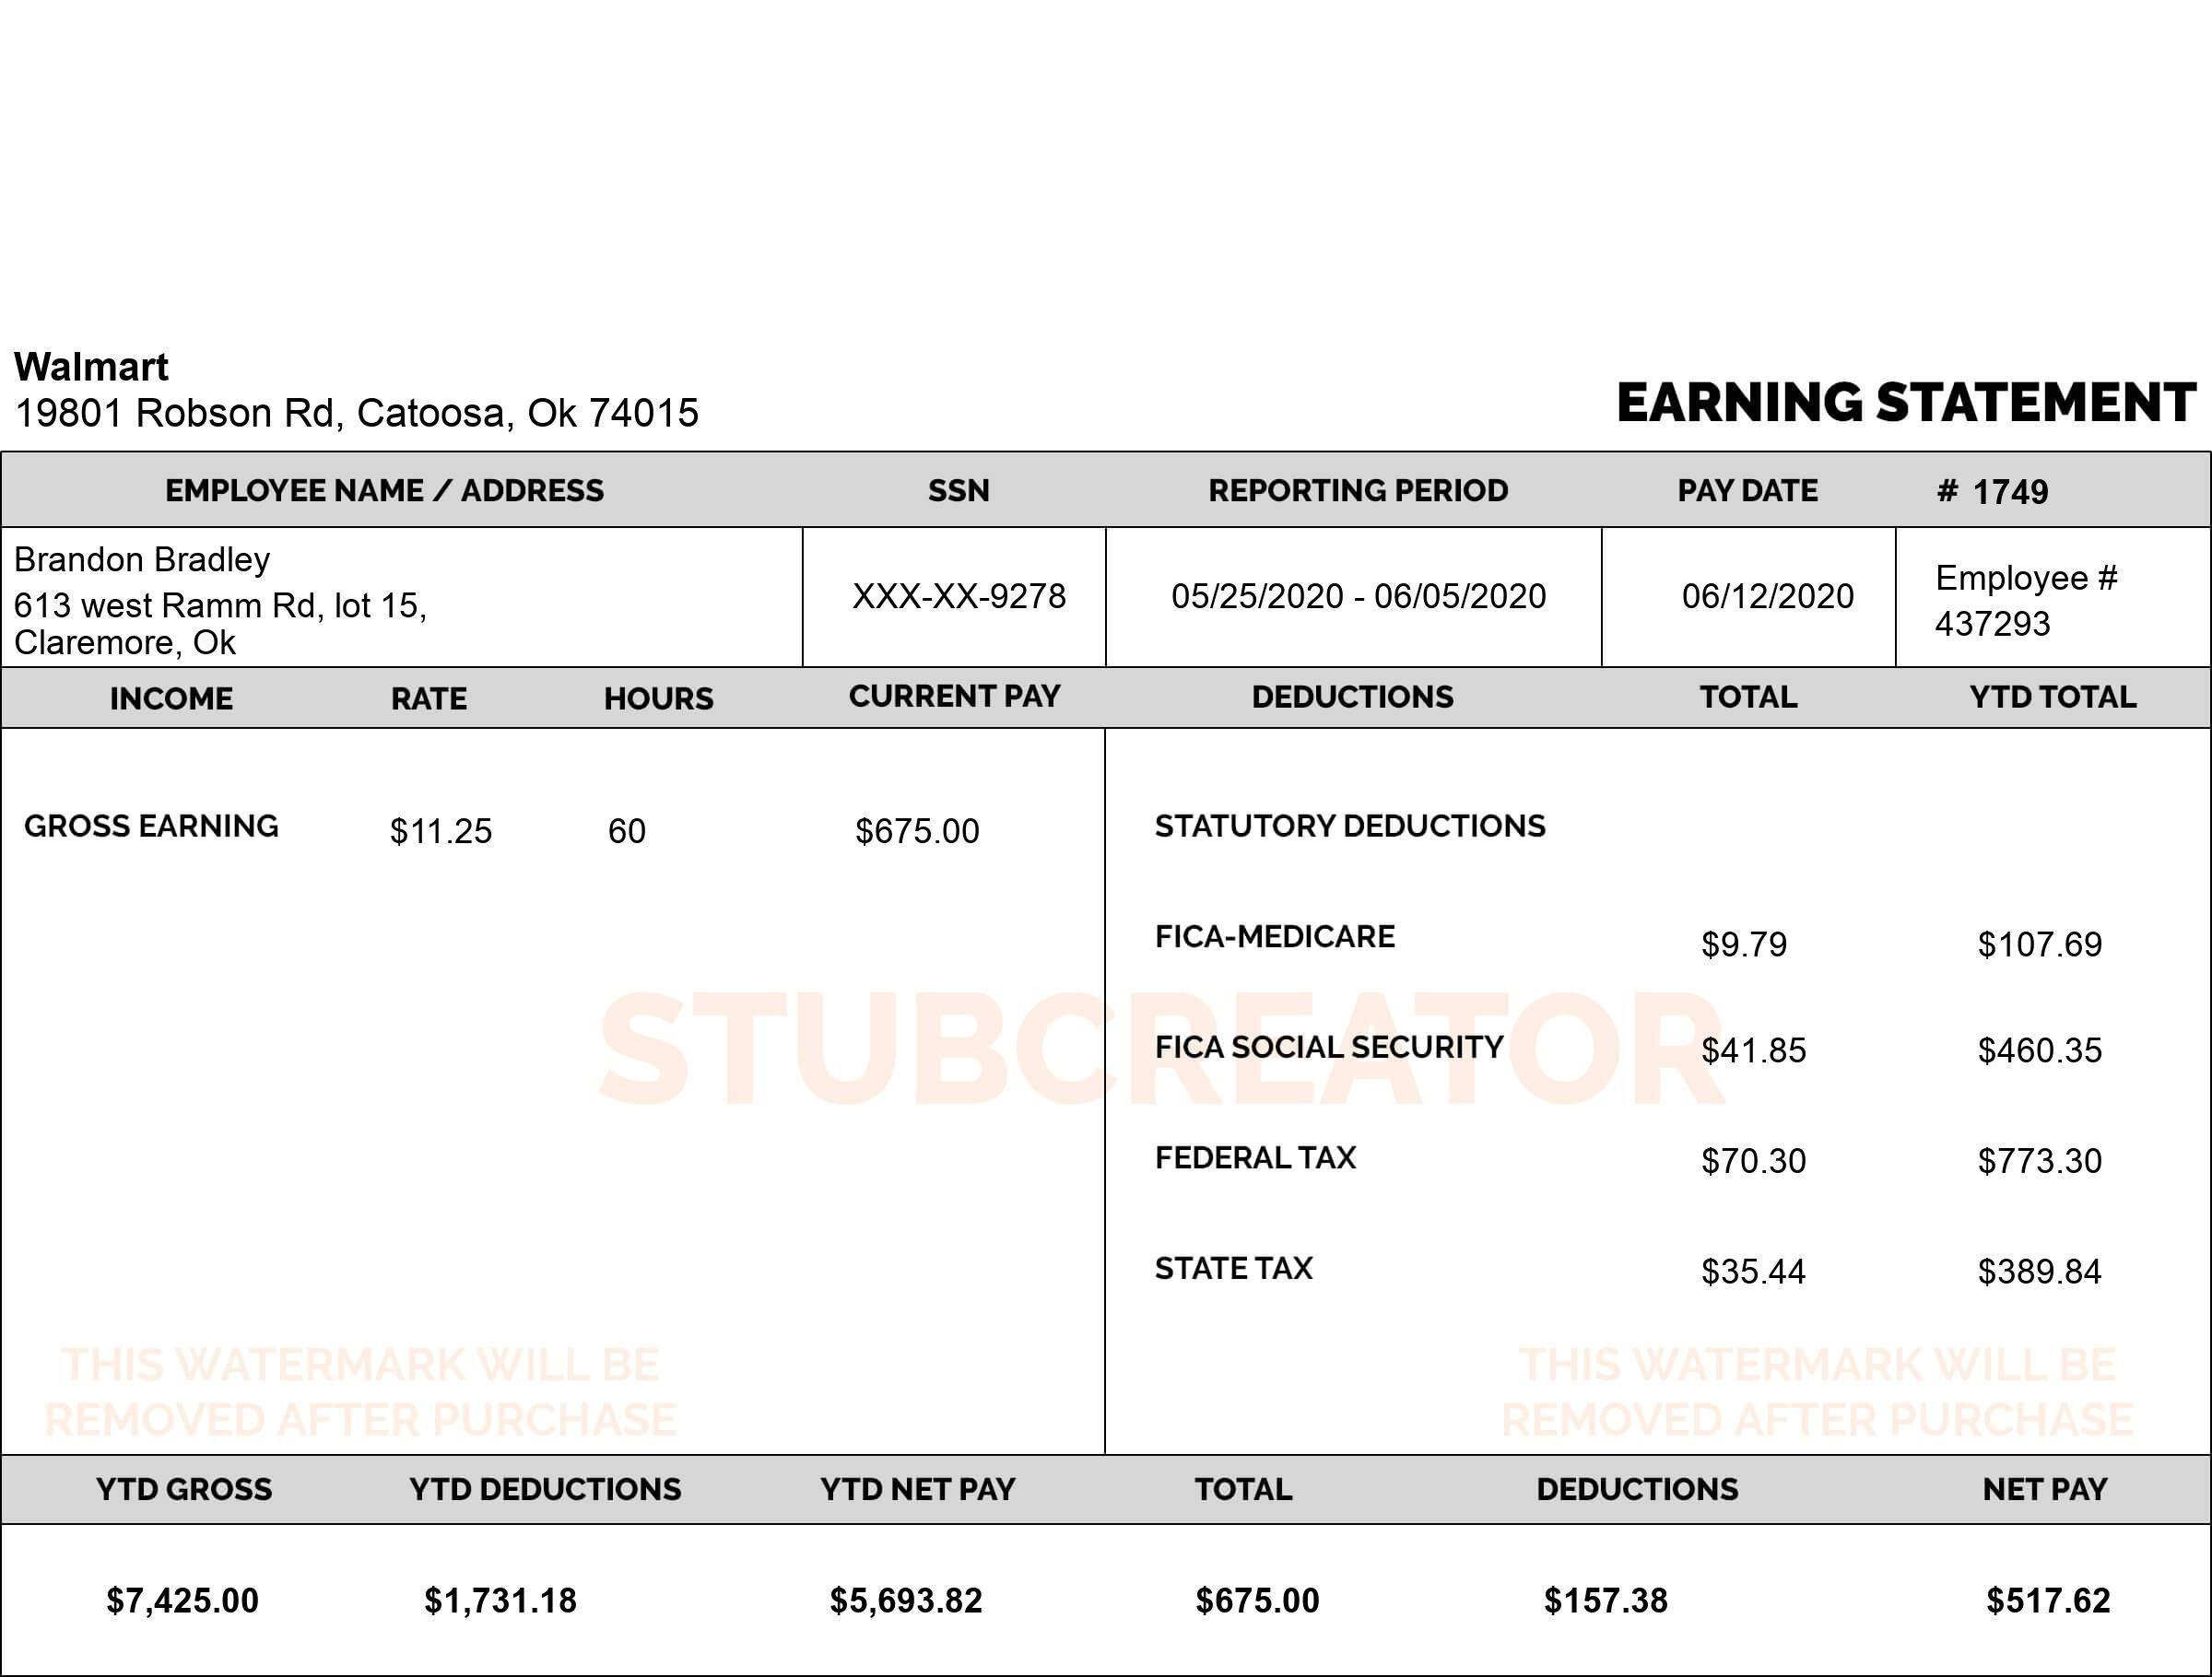 Free Pay Stub Generator Online Check Stub Maker Free Download Stubcreator Payroll Template Online Checks Free Checking Free download pay stub template